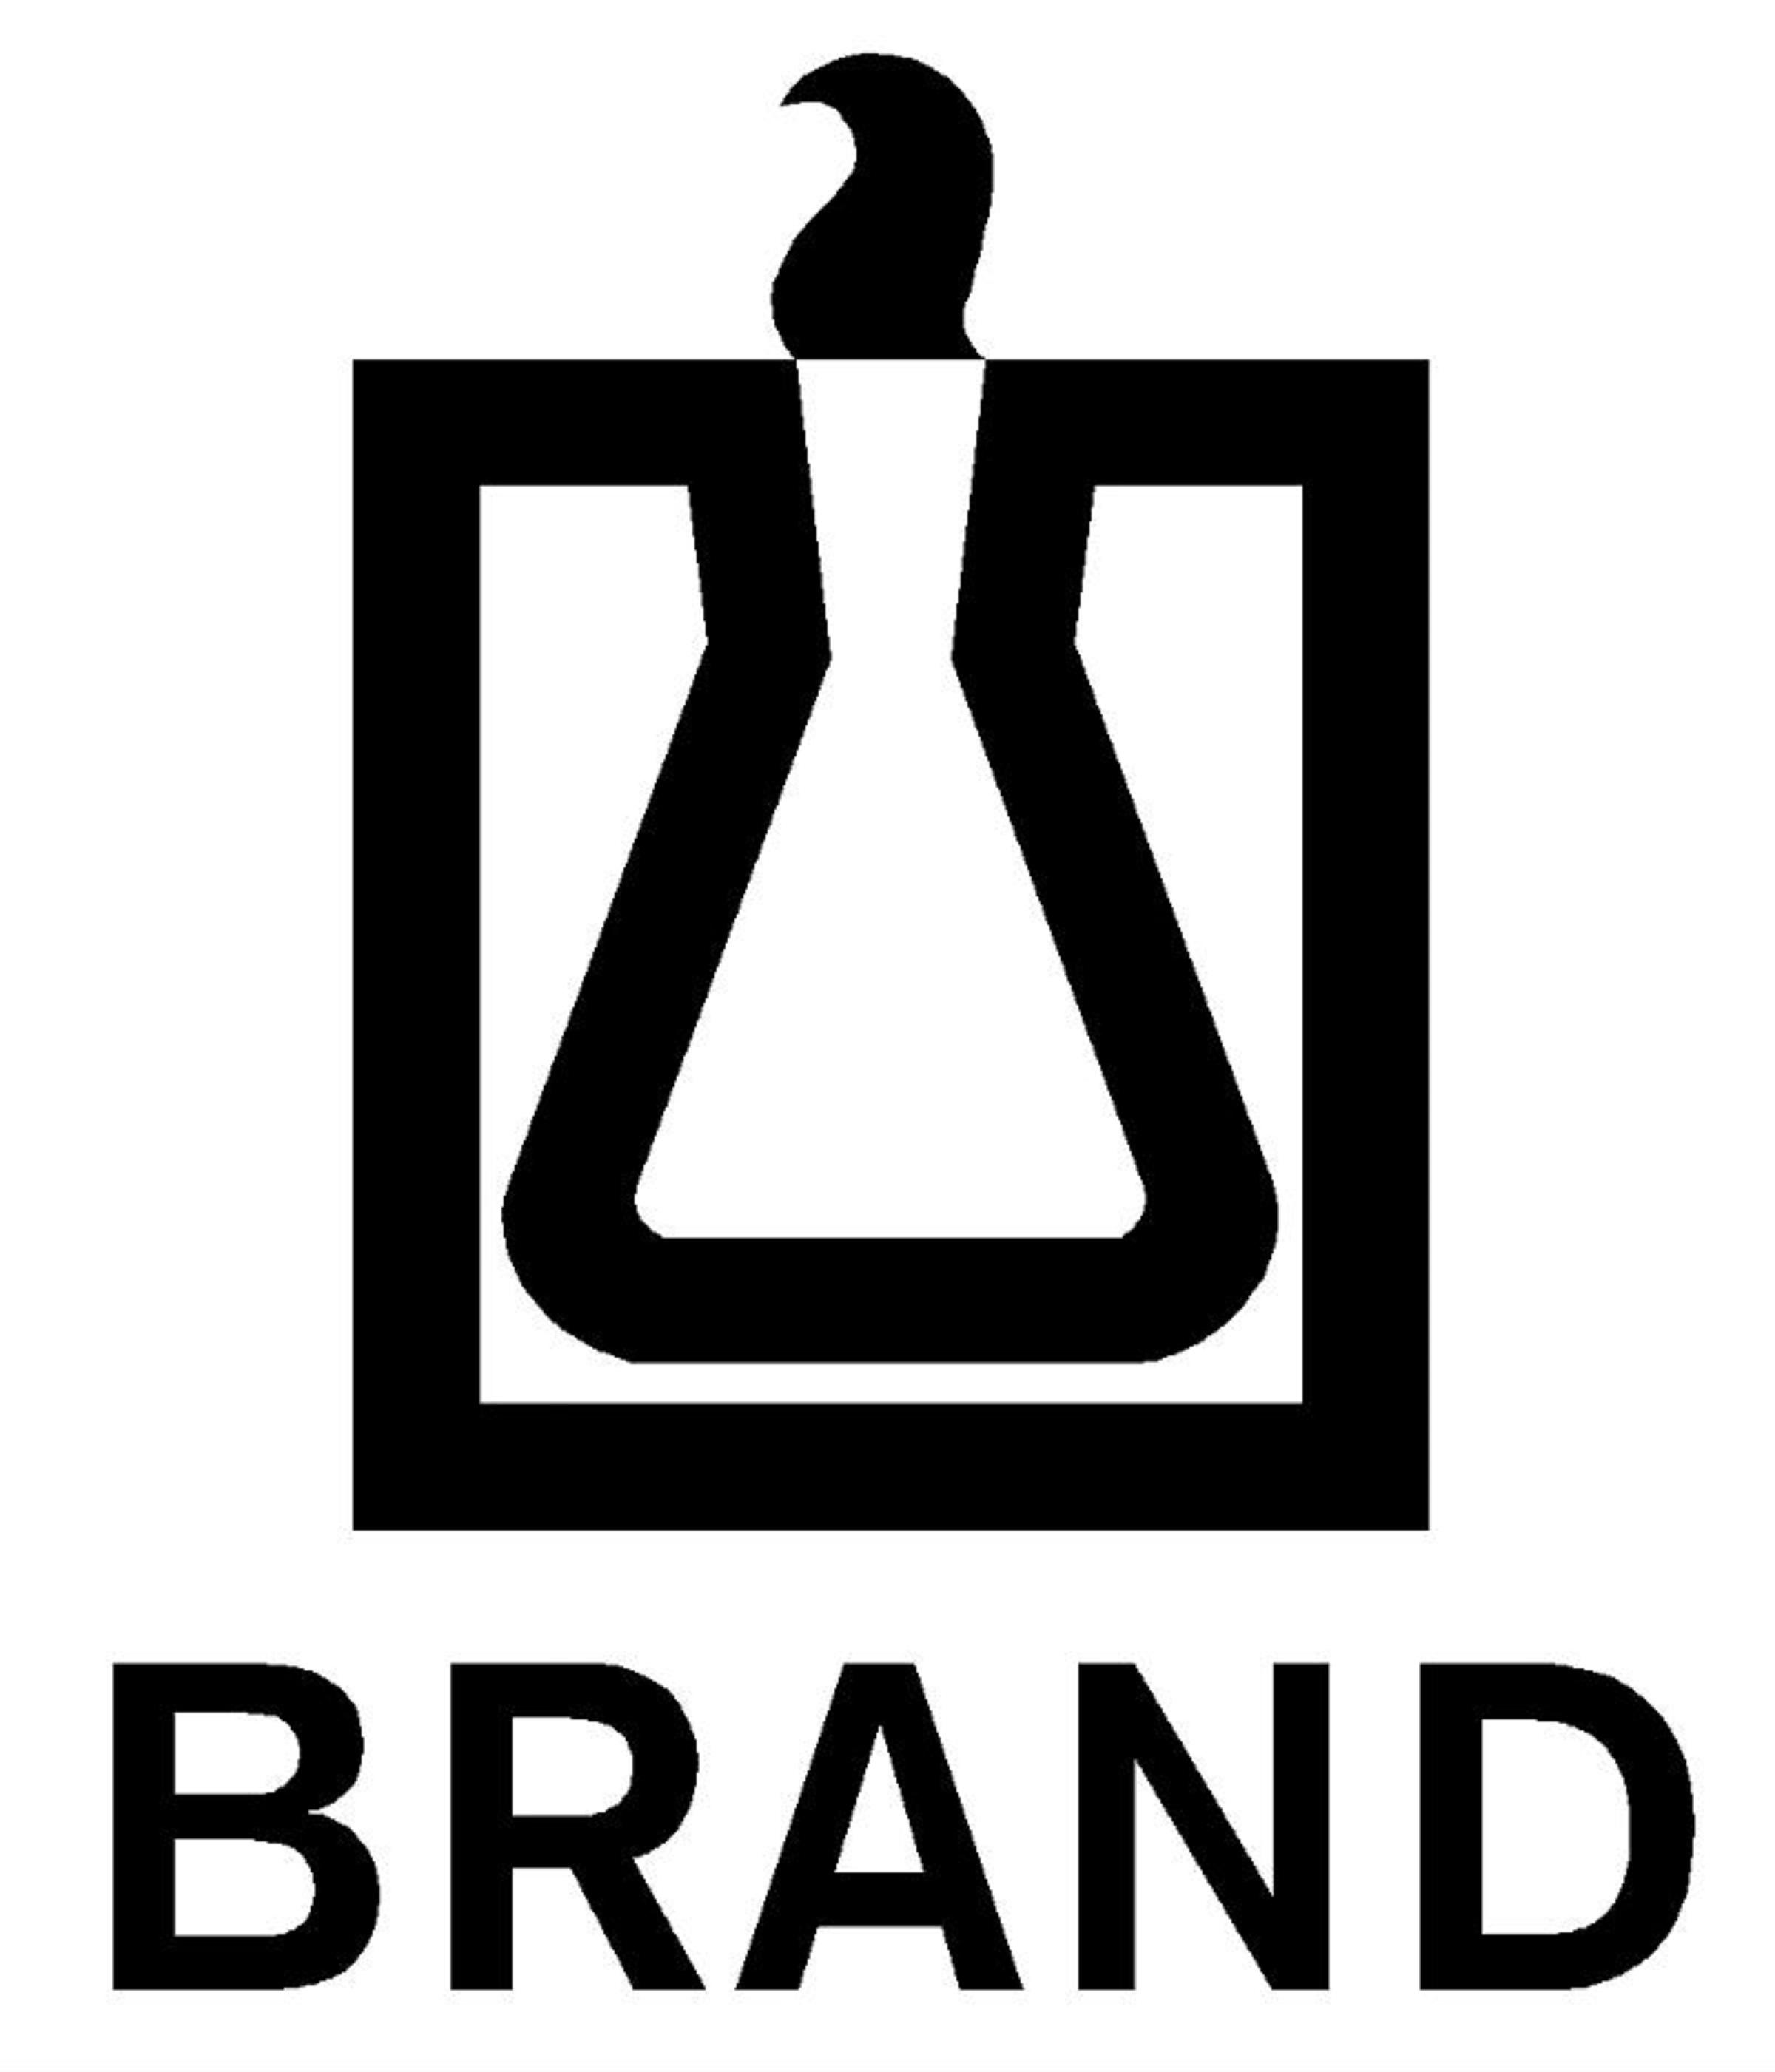 brand 1 - نمایندگی تجهیزات آزمایشگاهی